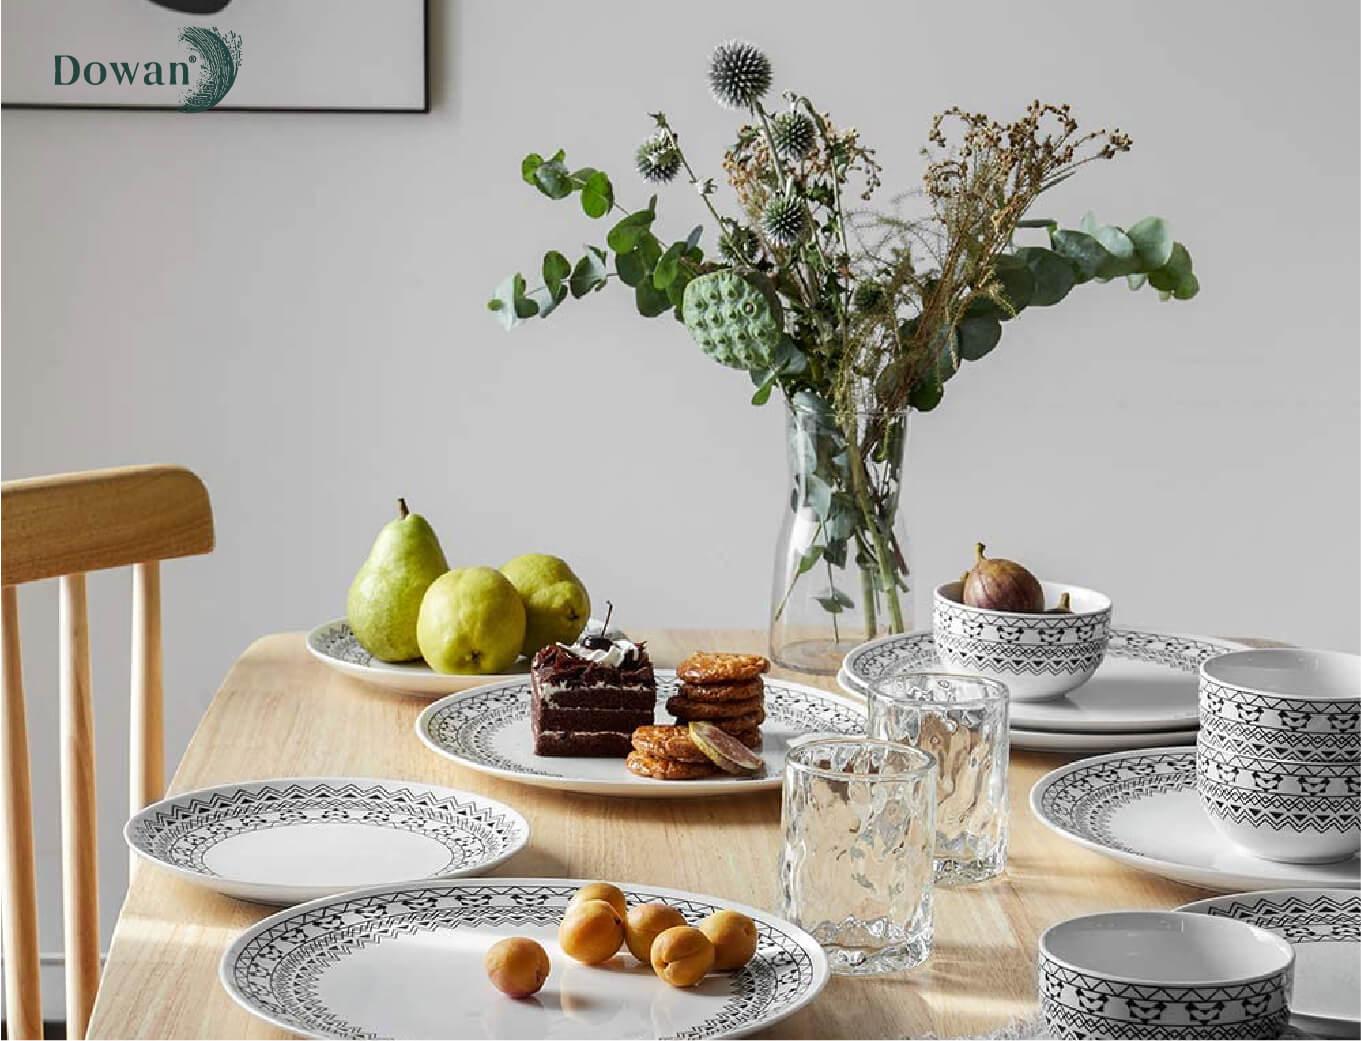 dowan design ceramics set showcase by orange branding